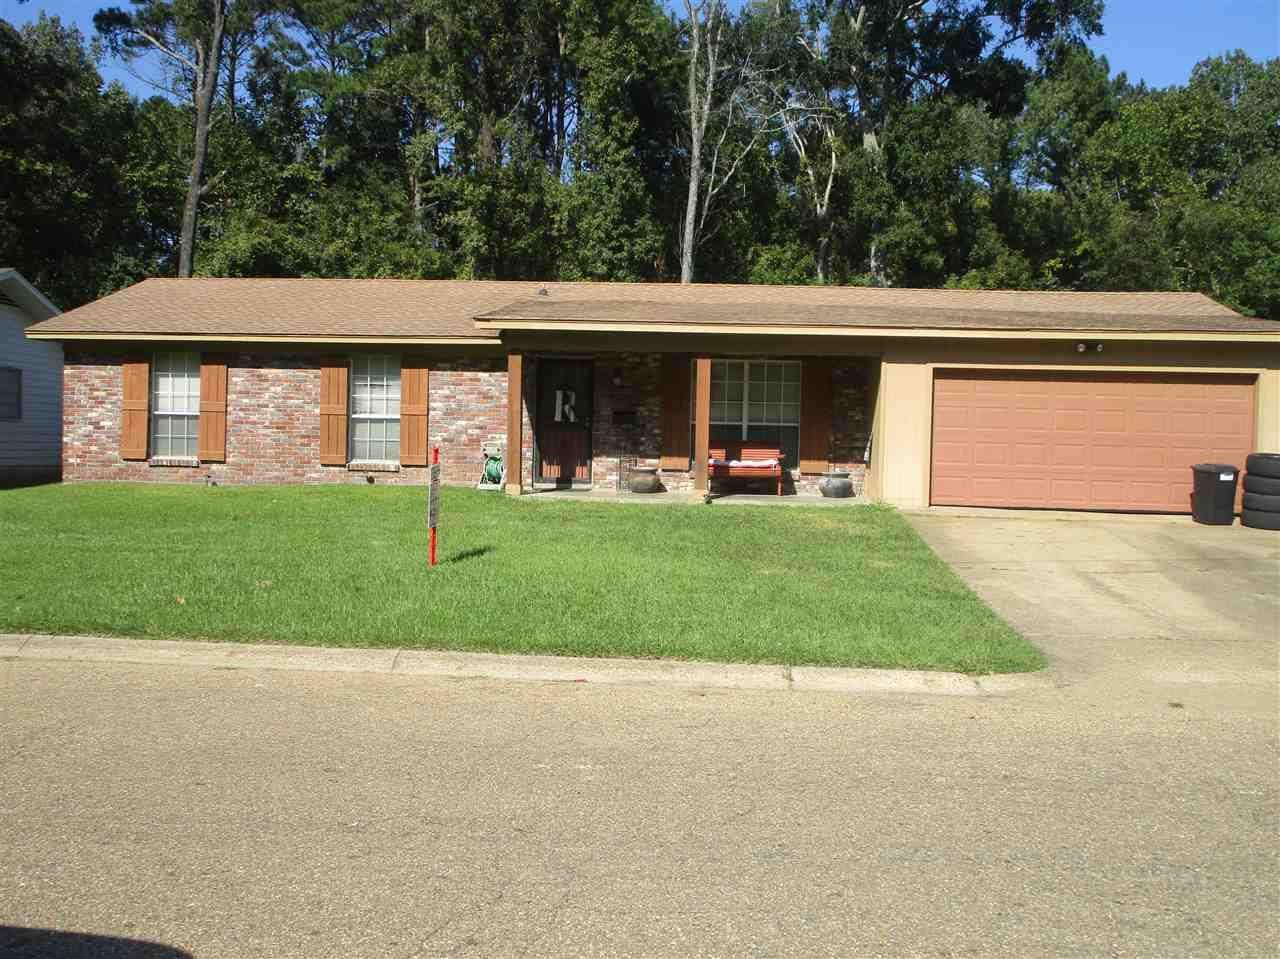 404 LYNWOOD LN, Jackson, MS 39206 - MLS#: 335021